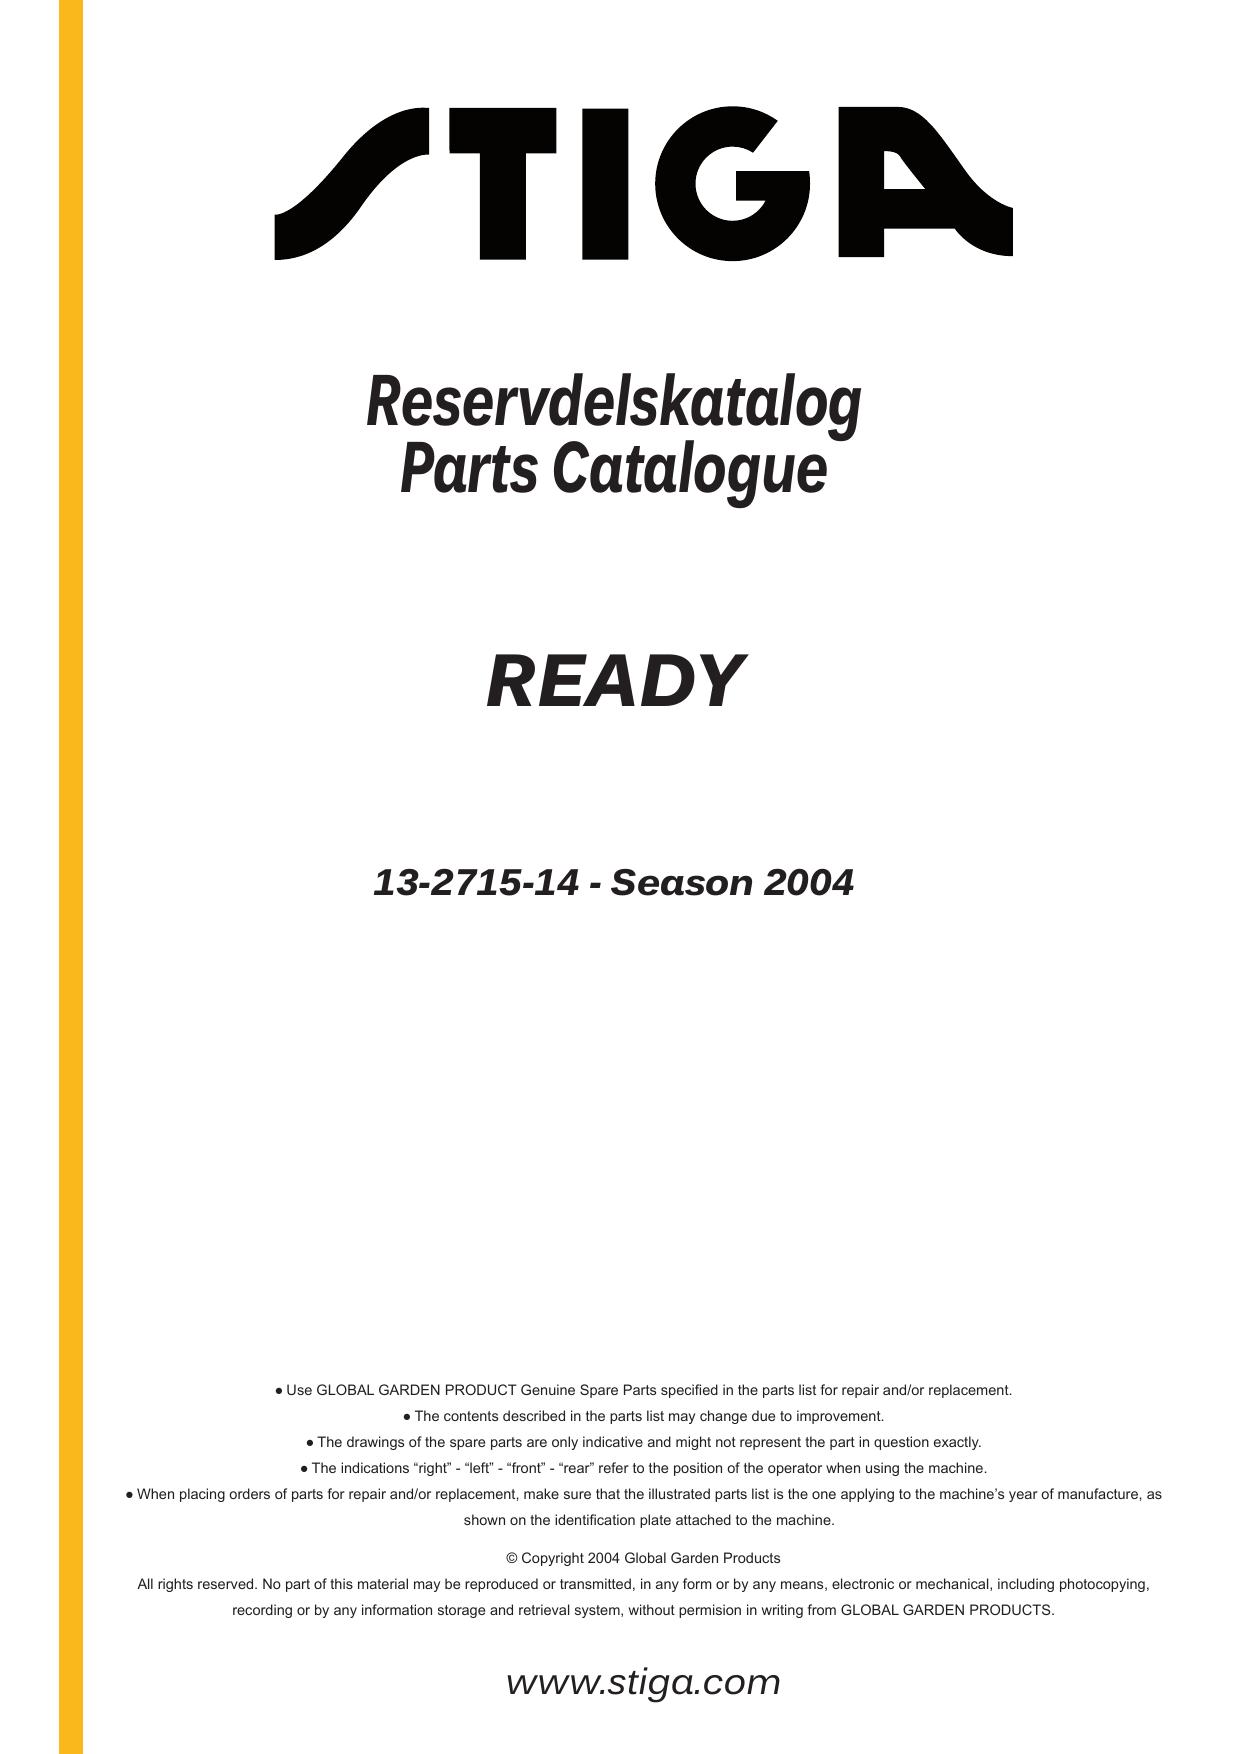 Stiga Ready Manual Electrical Wiring Diagram For The Es10pc System Array Reservdelskatalog Parts Catalogue 13 2715 14 Manualzz Com Rh